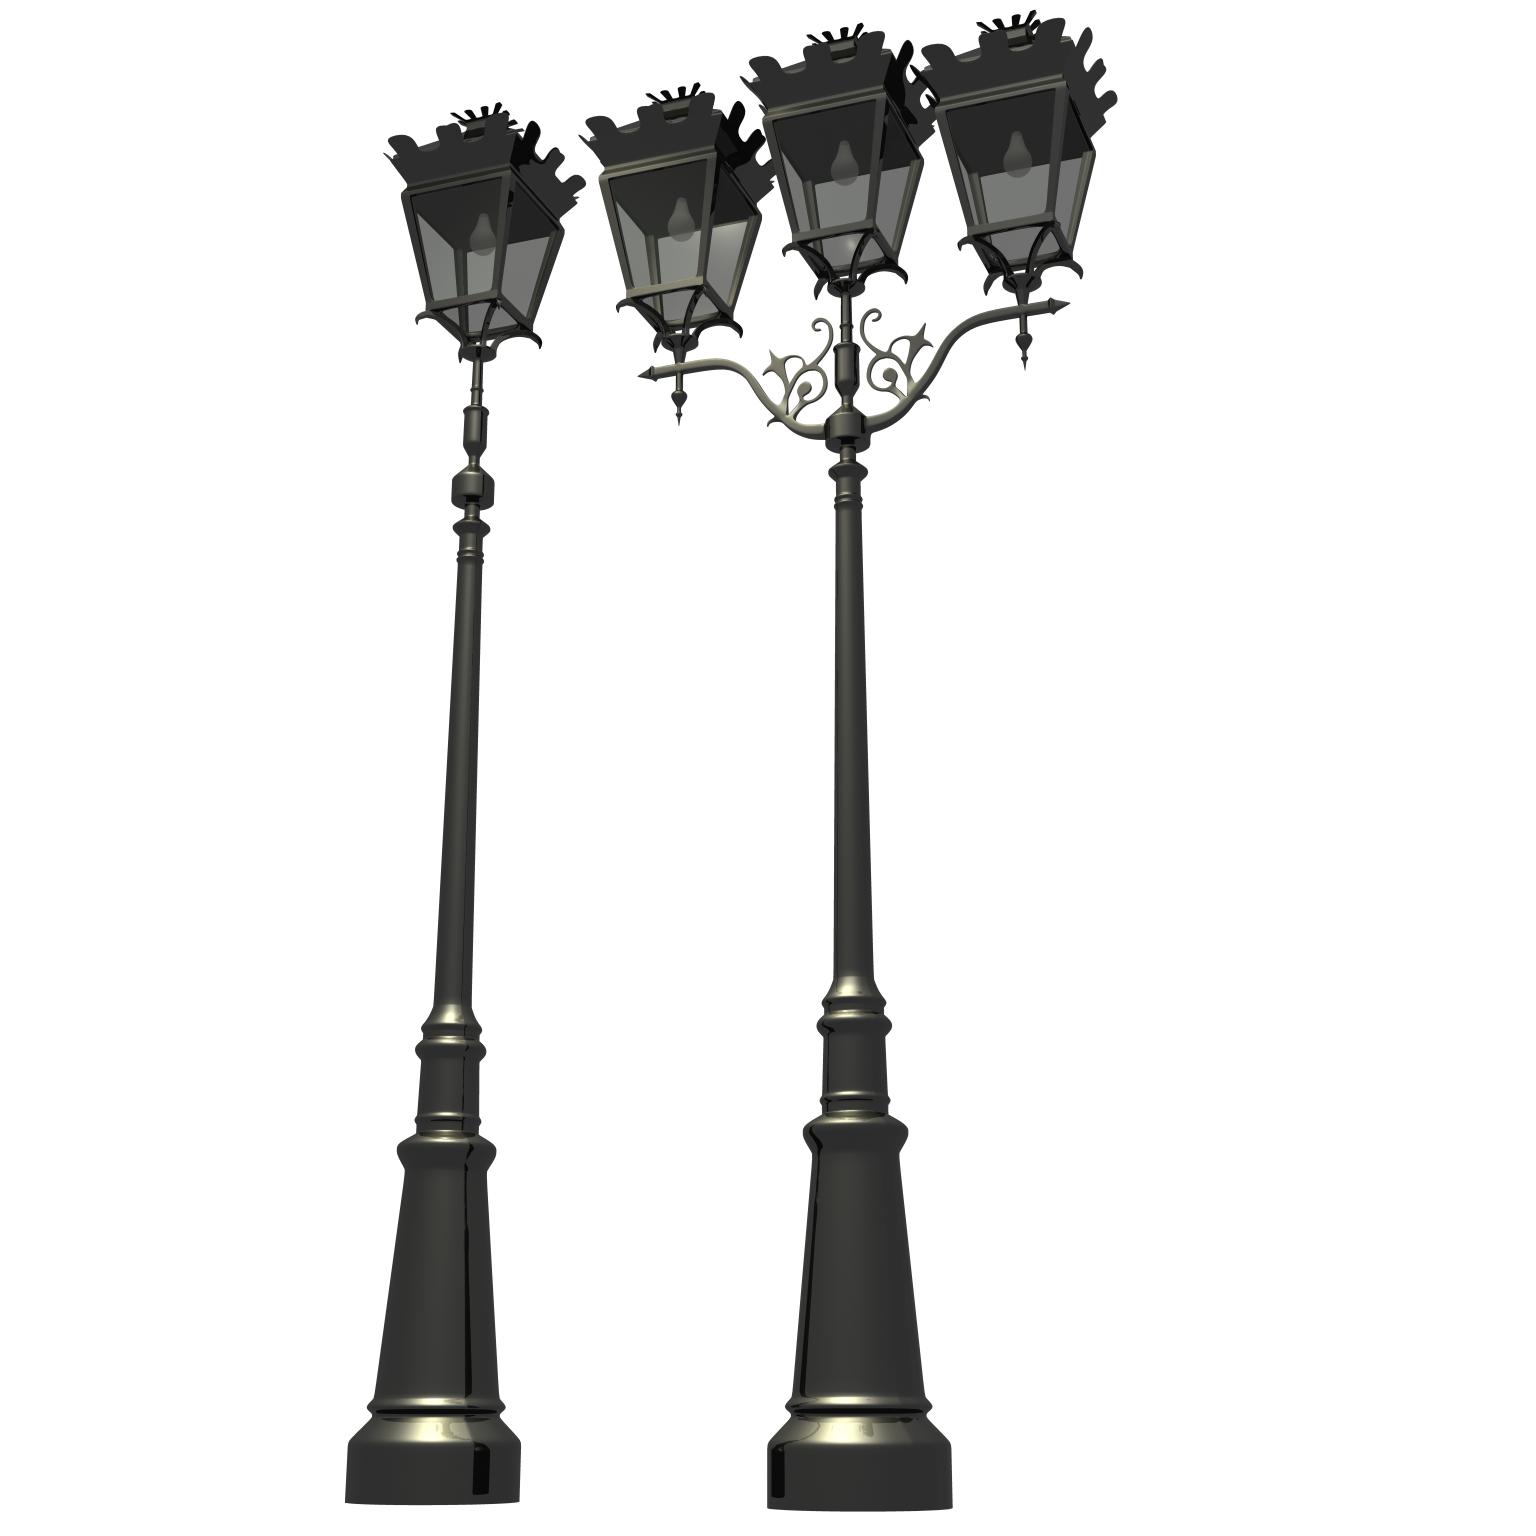 antique streetlight set 3d model ma mb flt 119131